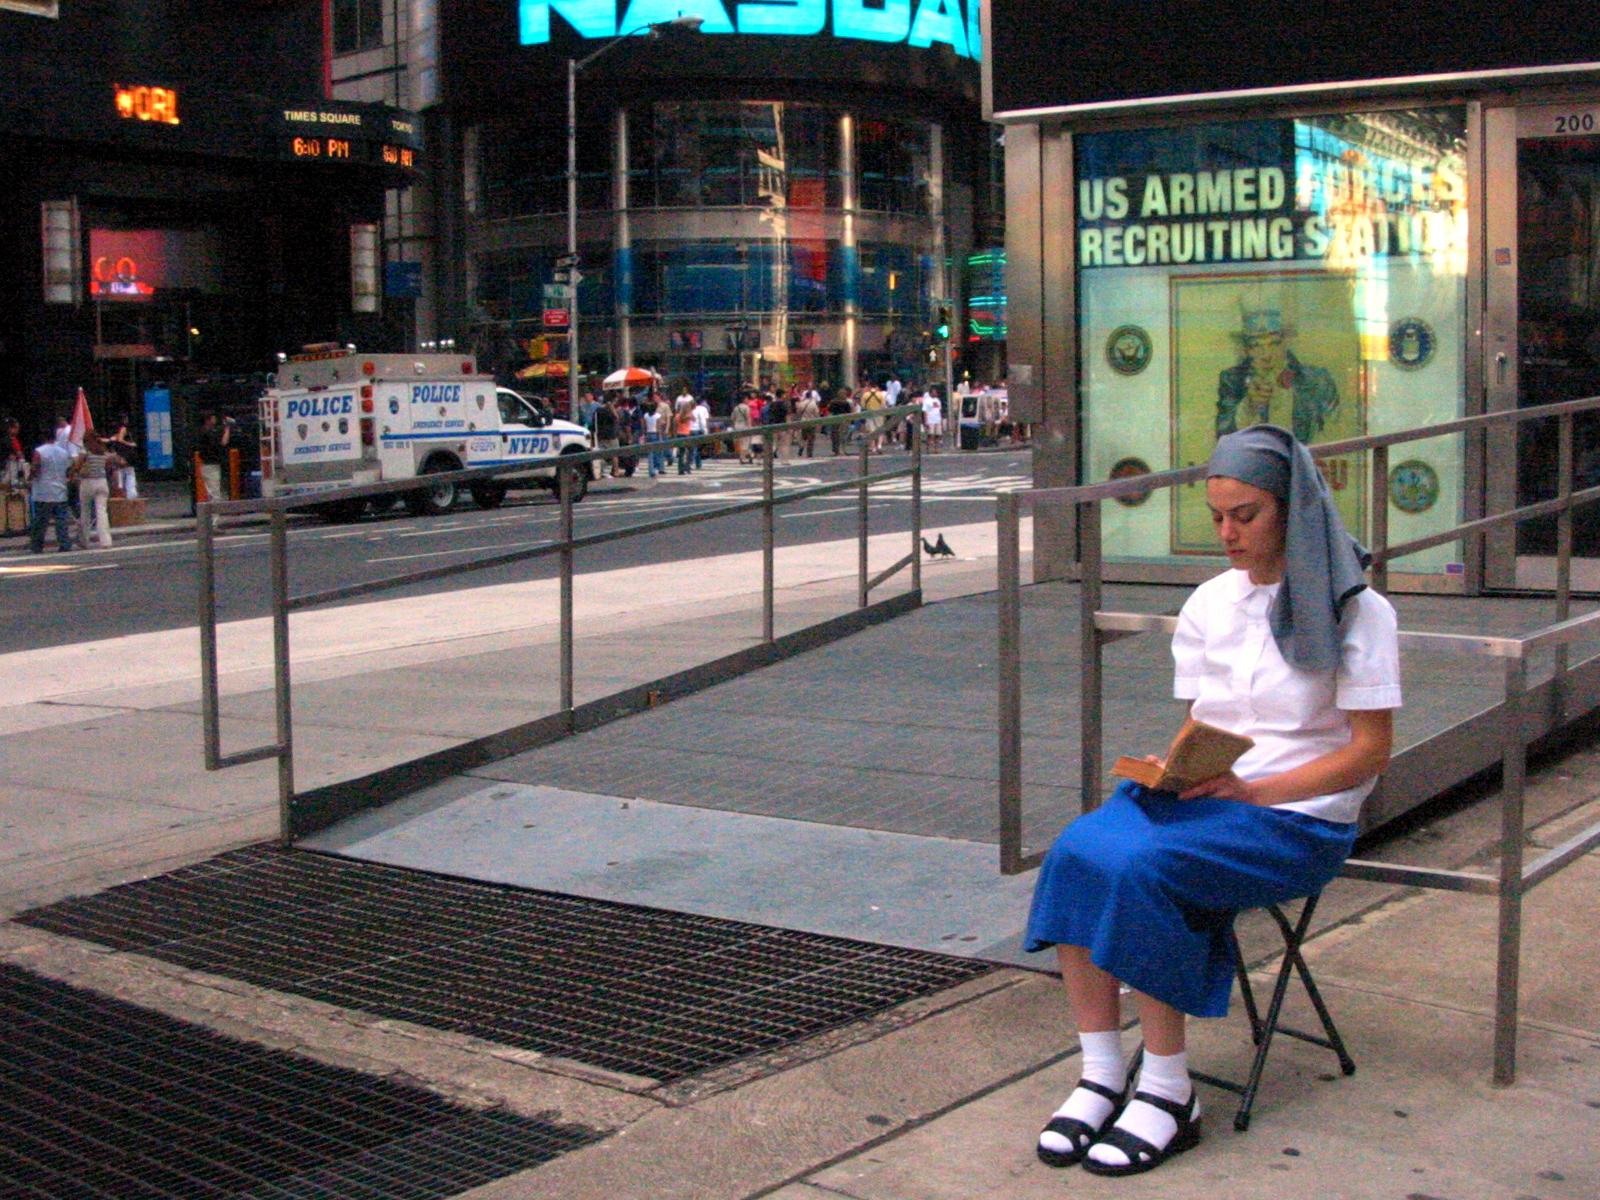 Times Square, New York NY